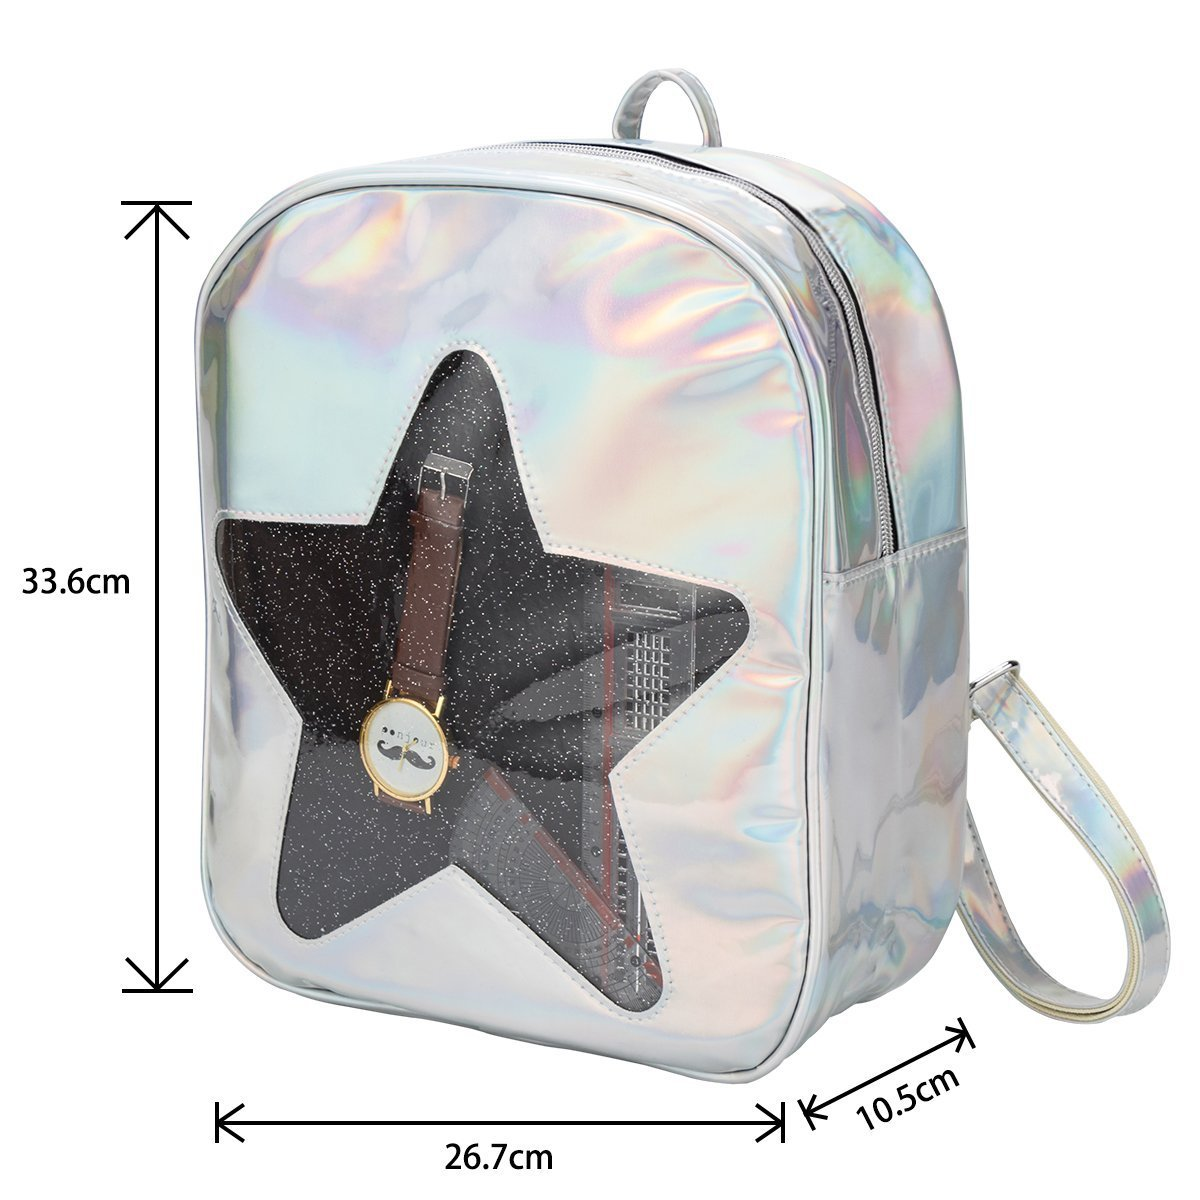 Girls Kawaii Bling Transparent Love Star School Bag Backpack (Star-Silver) by XSCOMSPORT (Image #2)